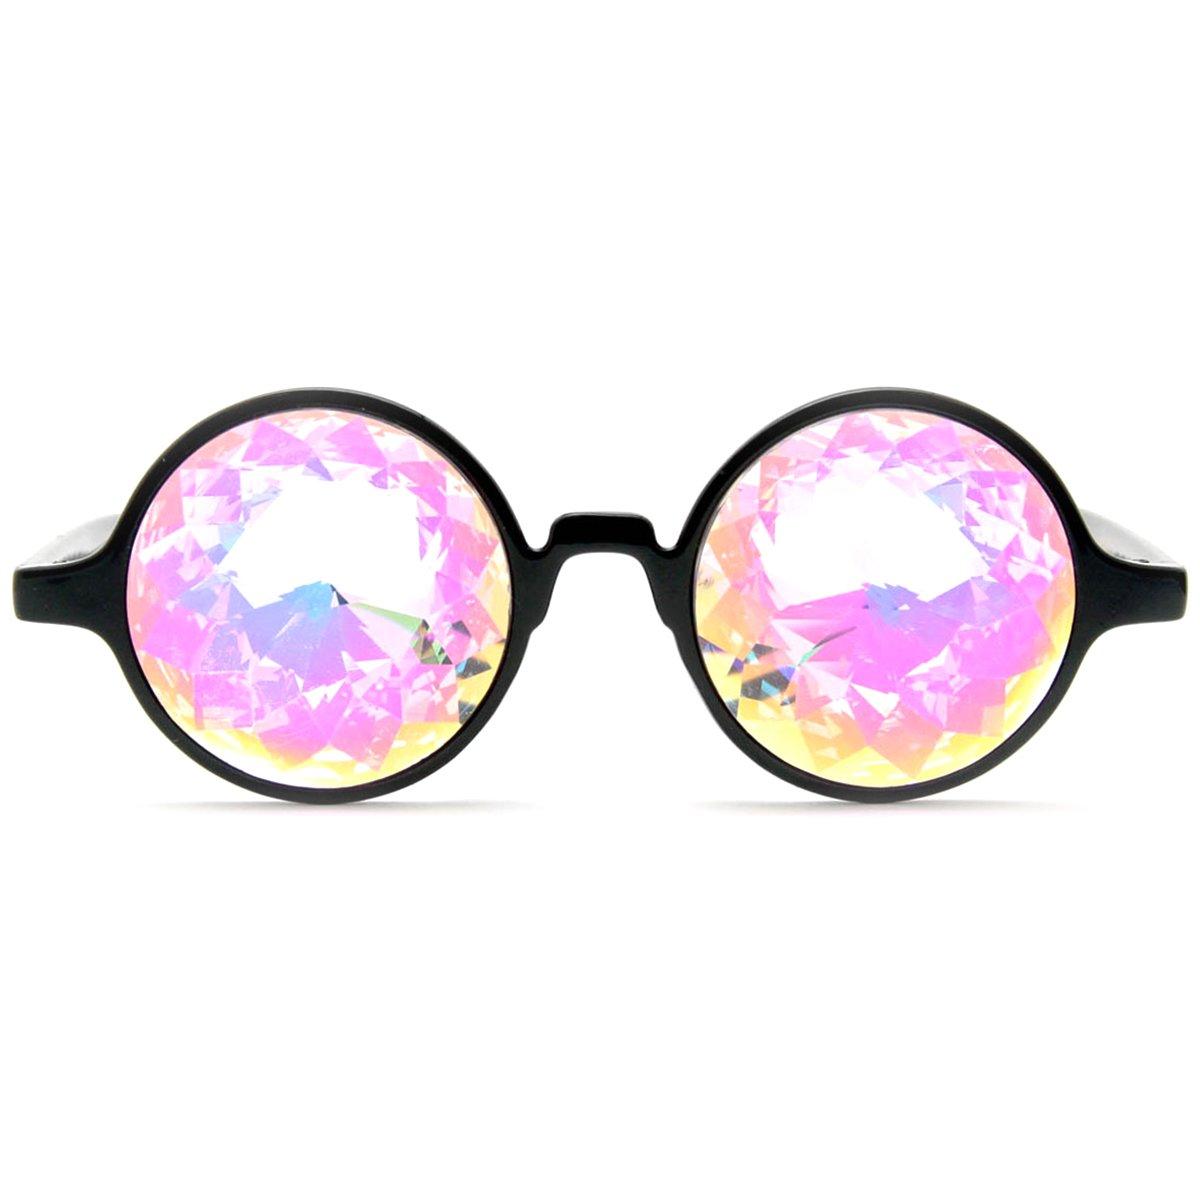 0f7c506c6c Amazon.com  GloFX Black Kaleidoscope Glasses- Rainbow Rave Prism  Diffraction  Clothing